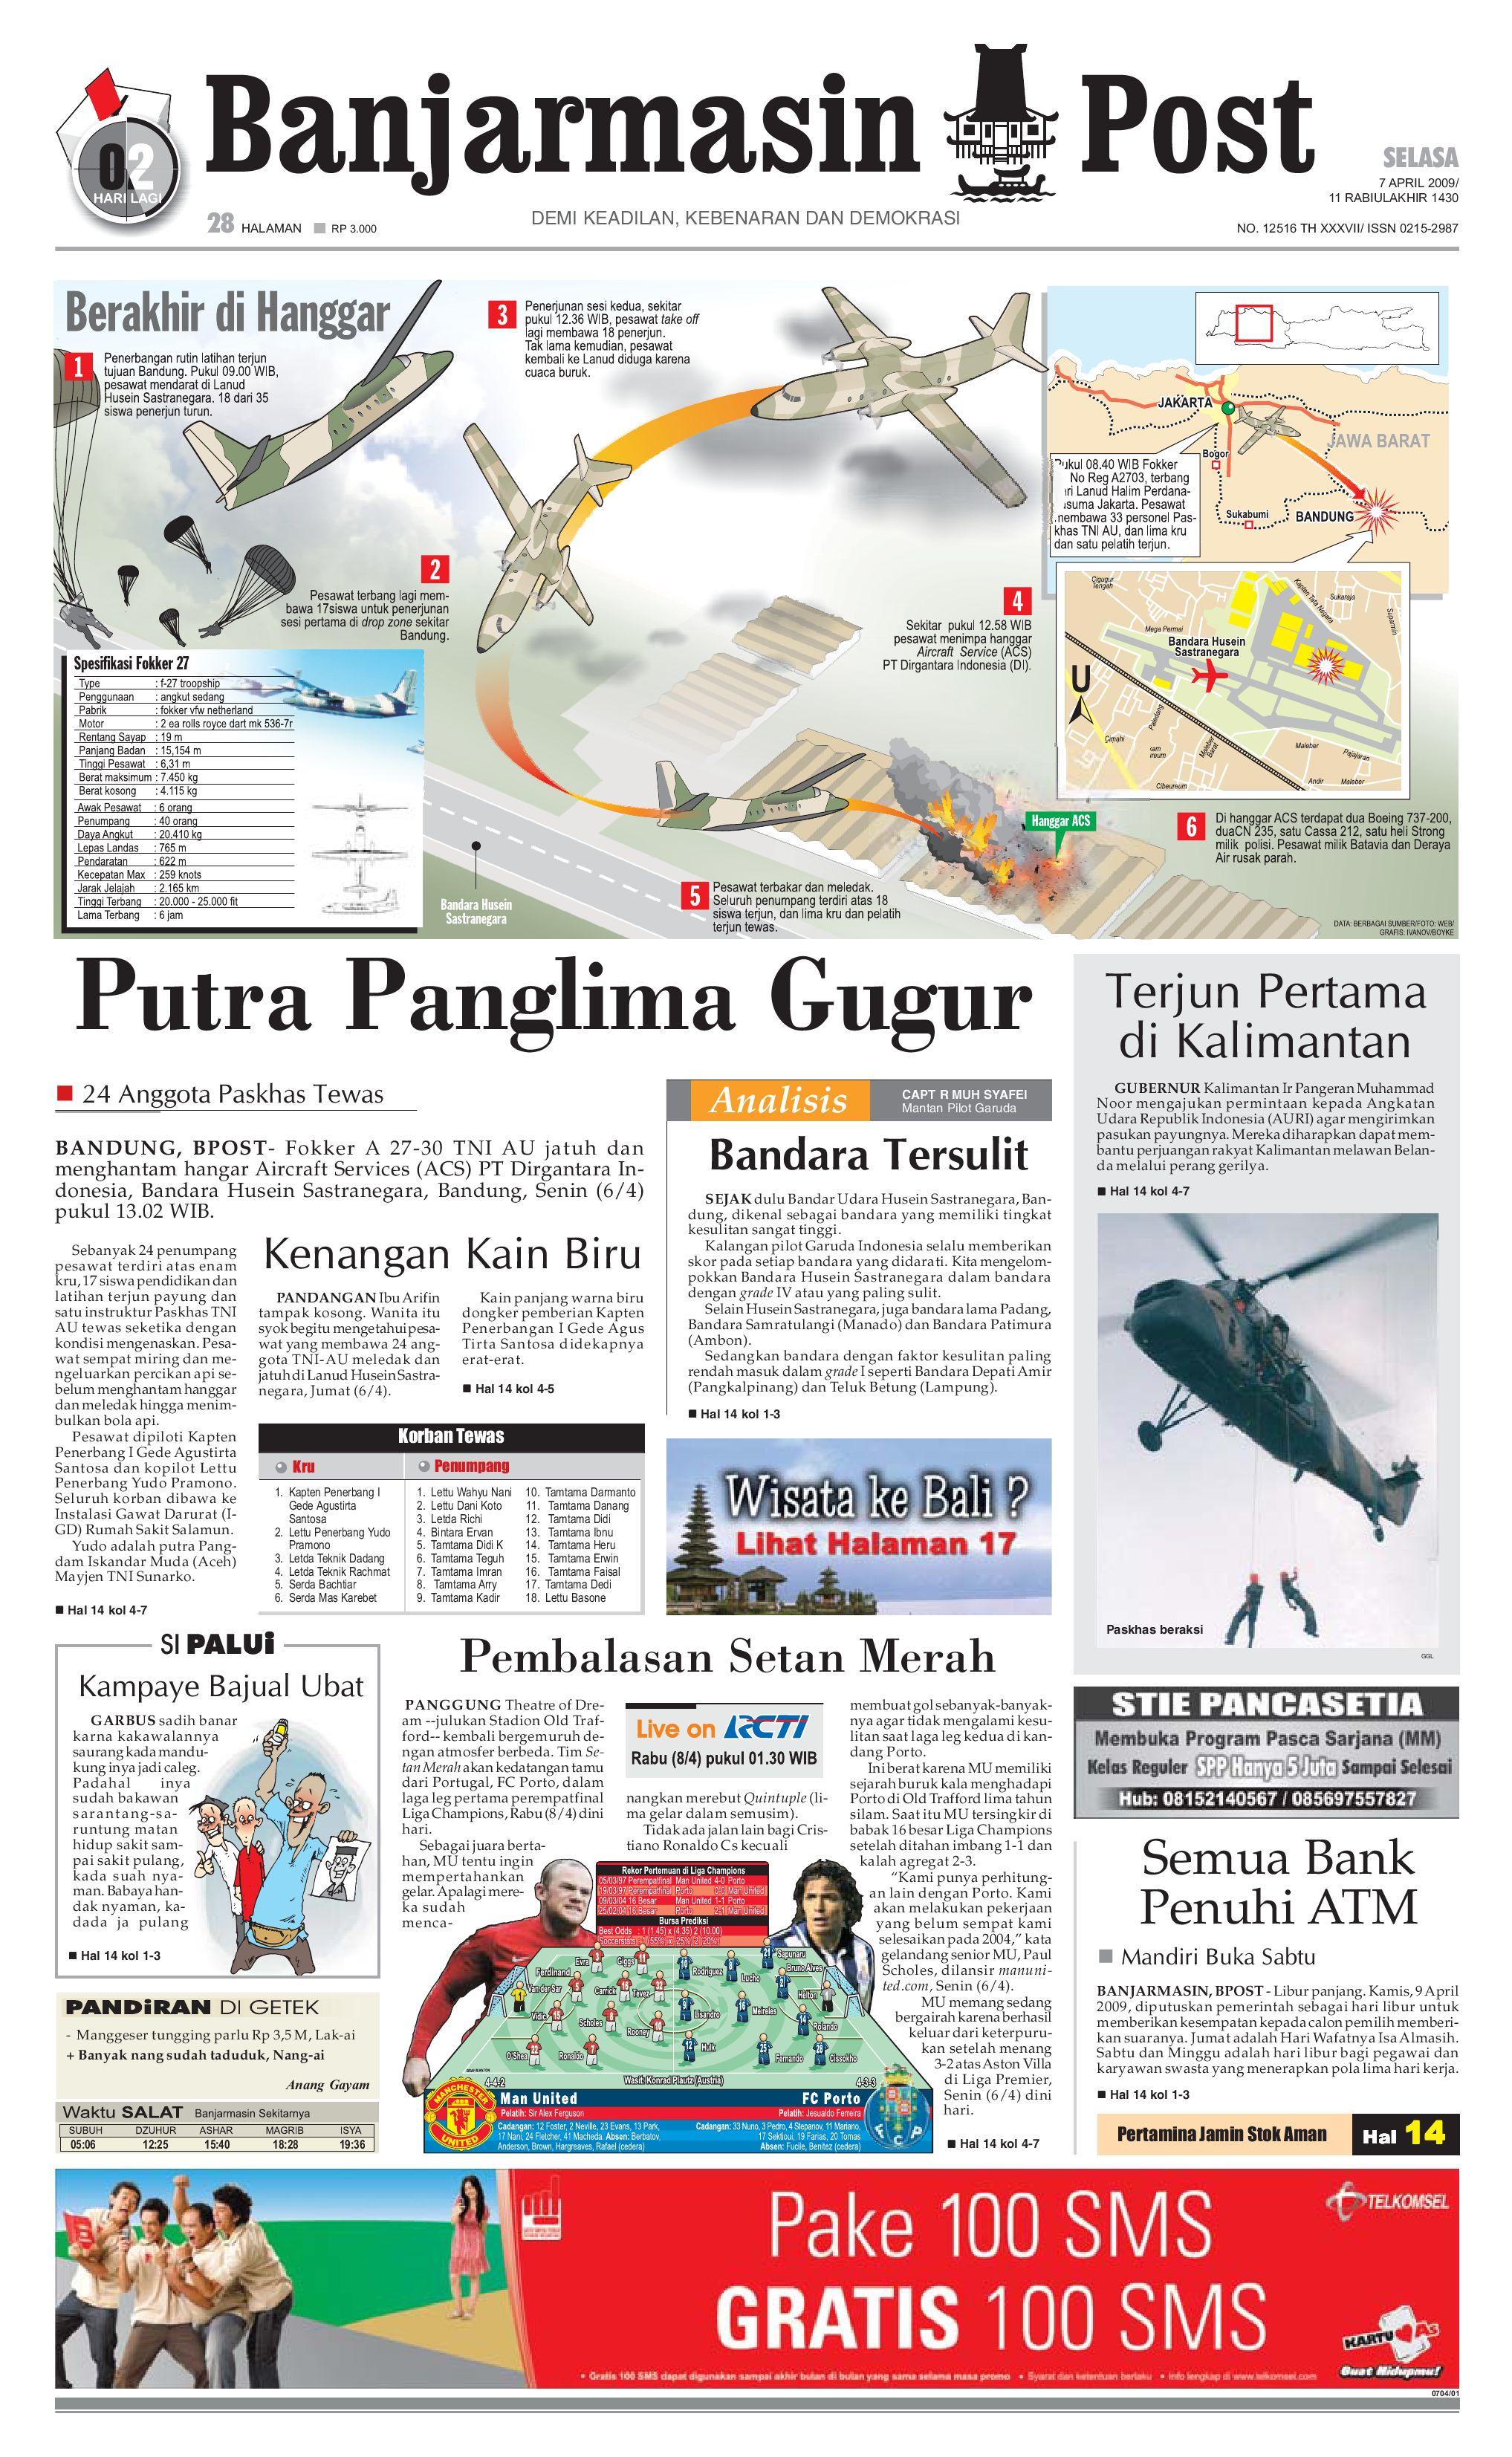 Banjarmasin Post 7 April 2009 By Issuu Fcenter Meja Makan Dt Sienna Dan Dc Danish Jabodetabek